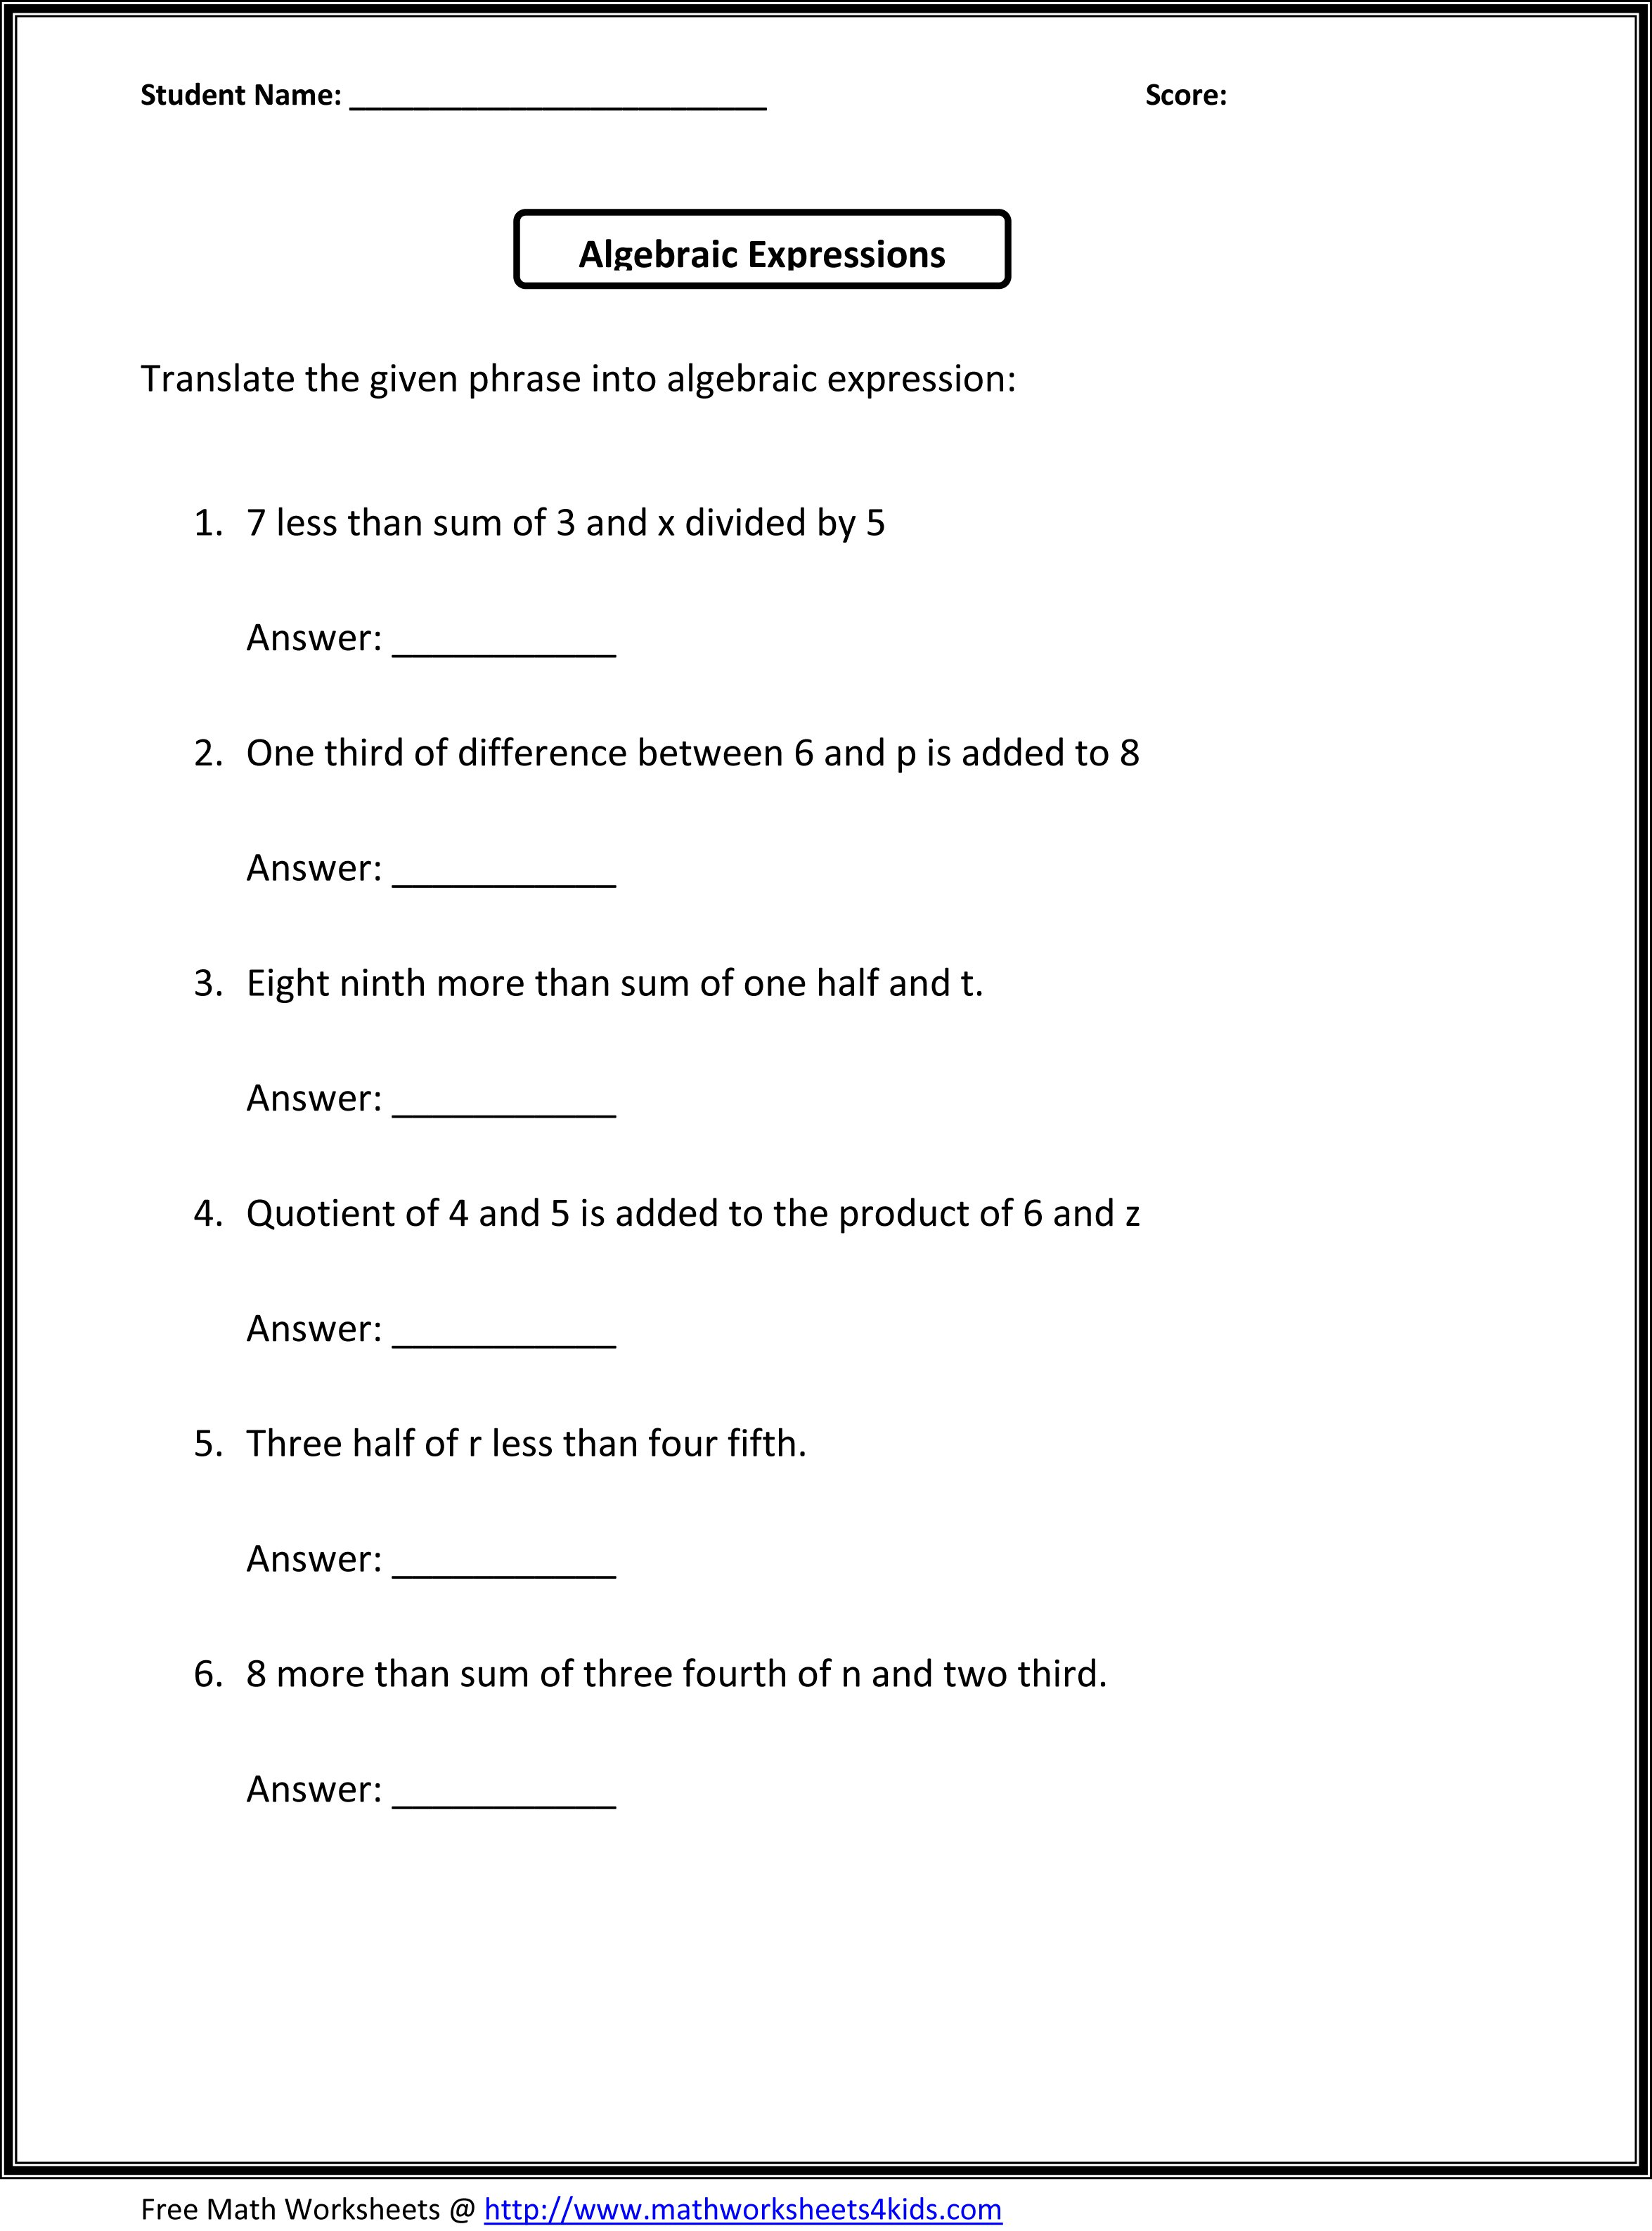 Algebraic Expressions 6th Grade Worksheets